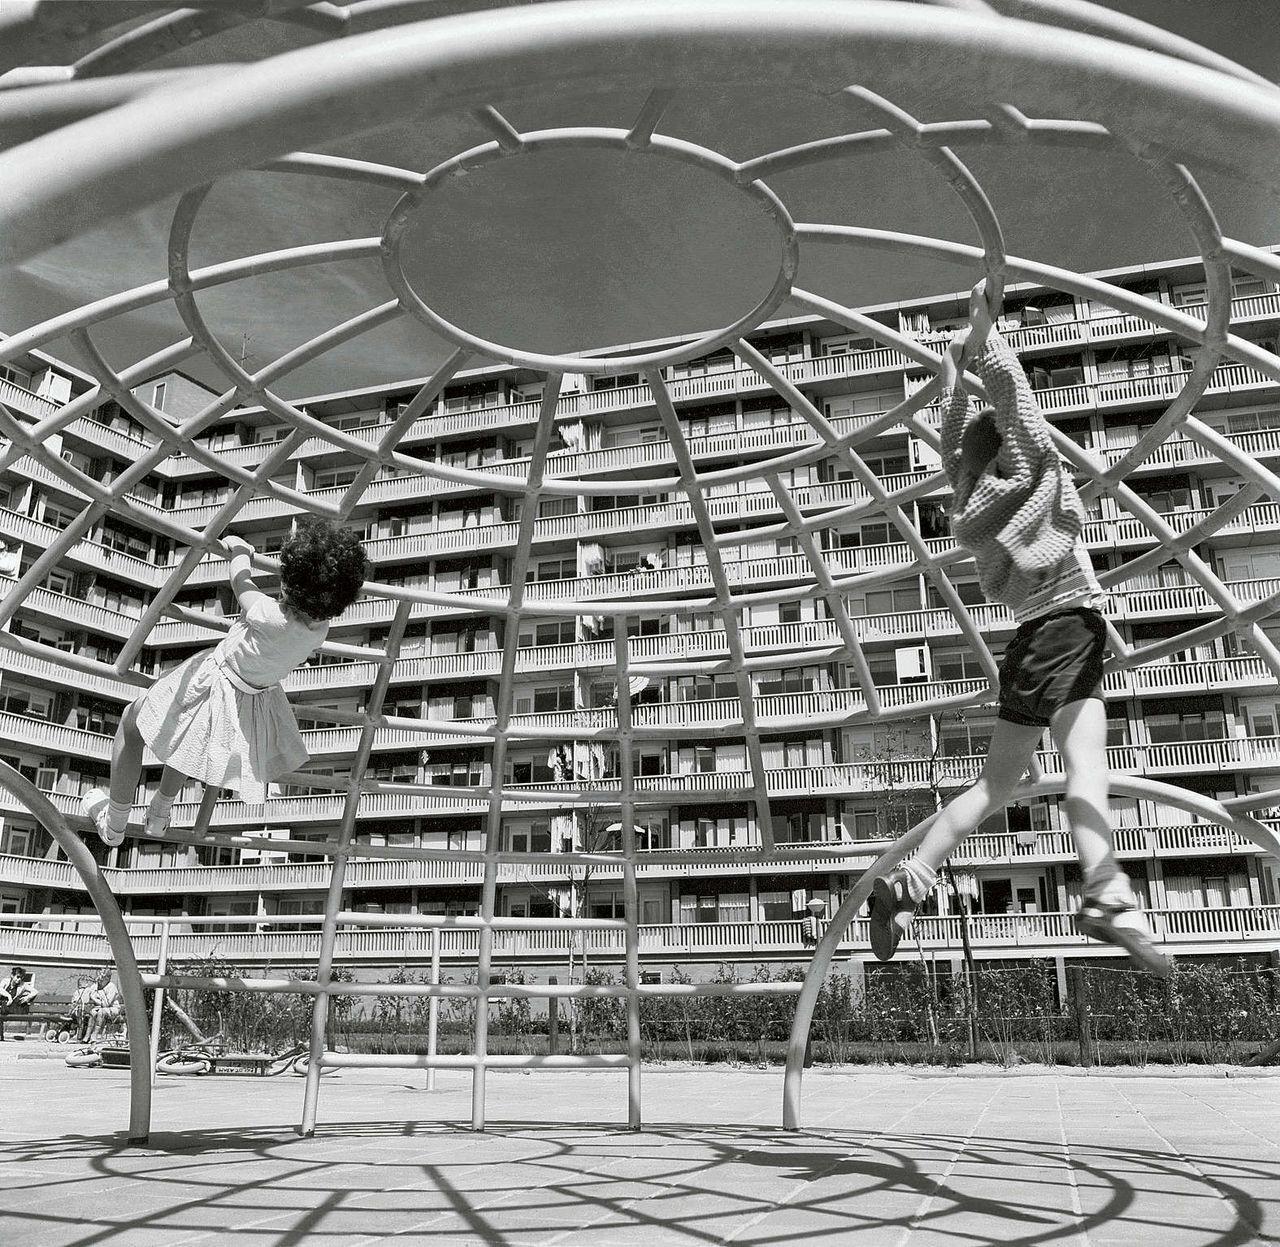 Klimrek van architect Aldo van Eyck, ca 1960